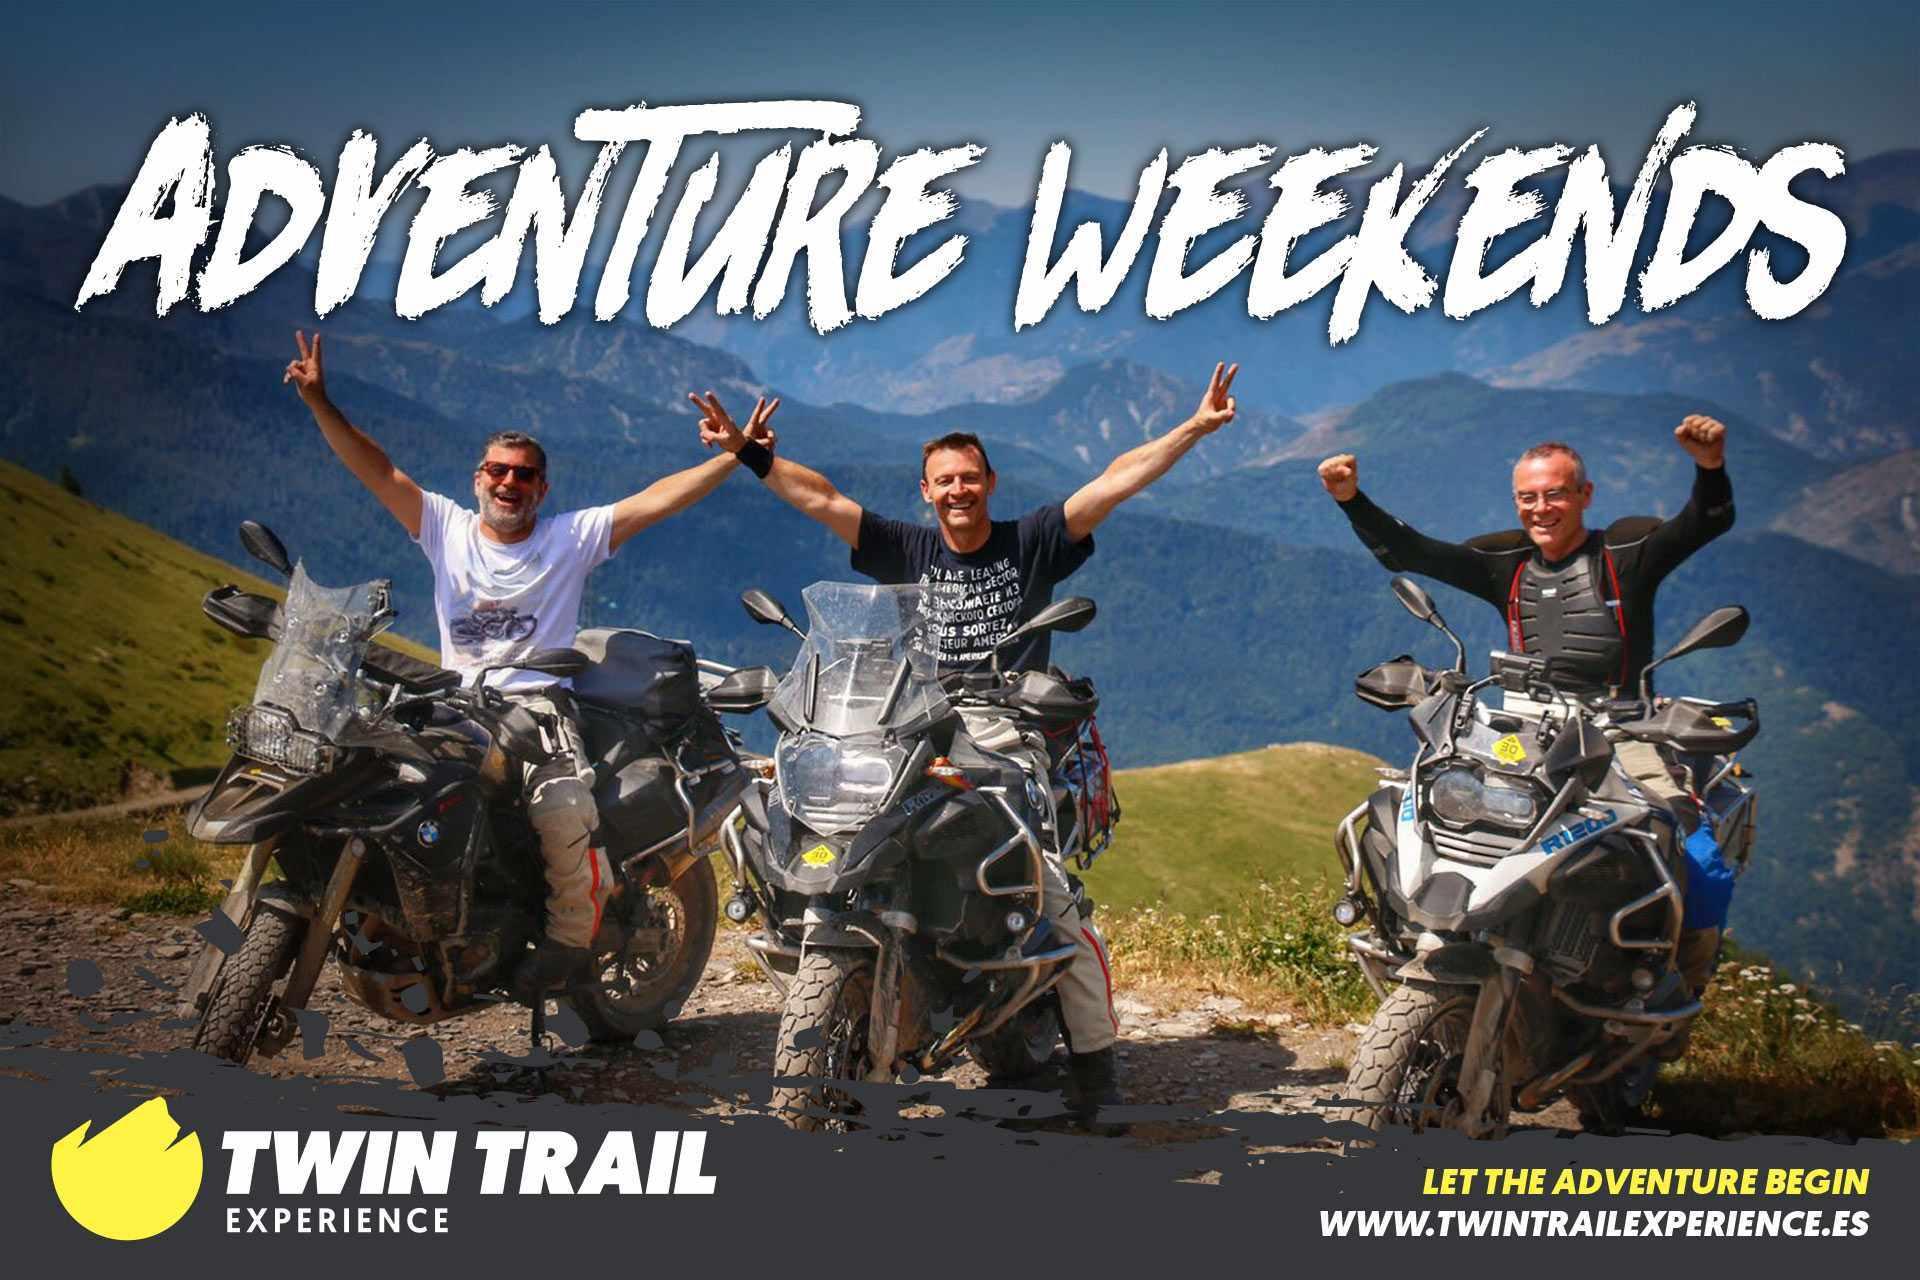 TwinTrail Adventure Weekends